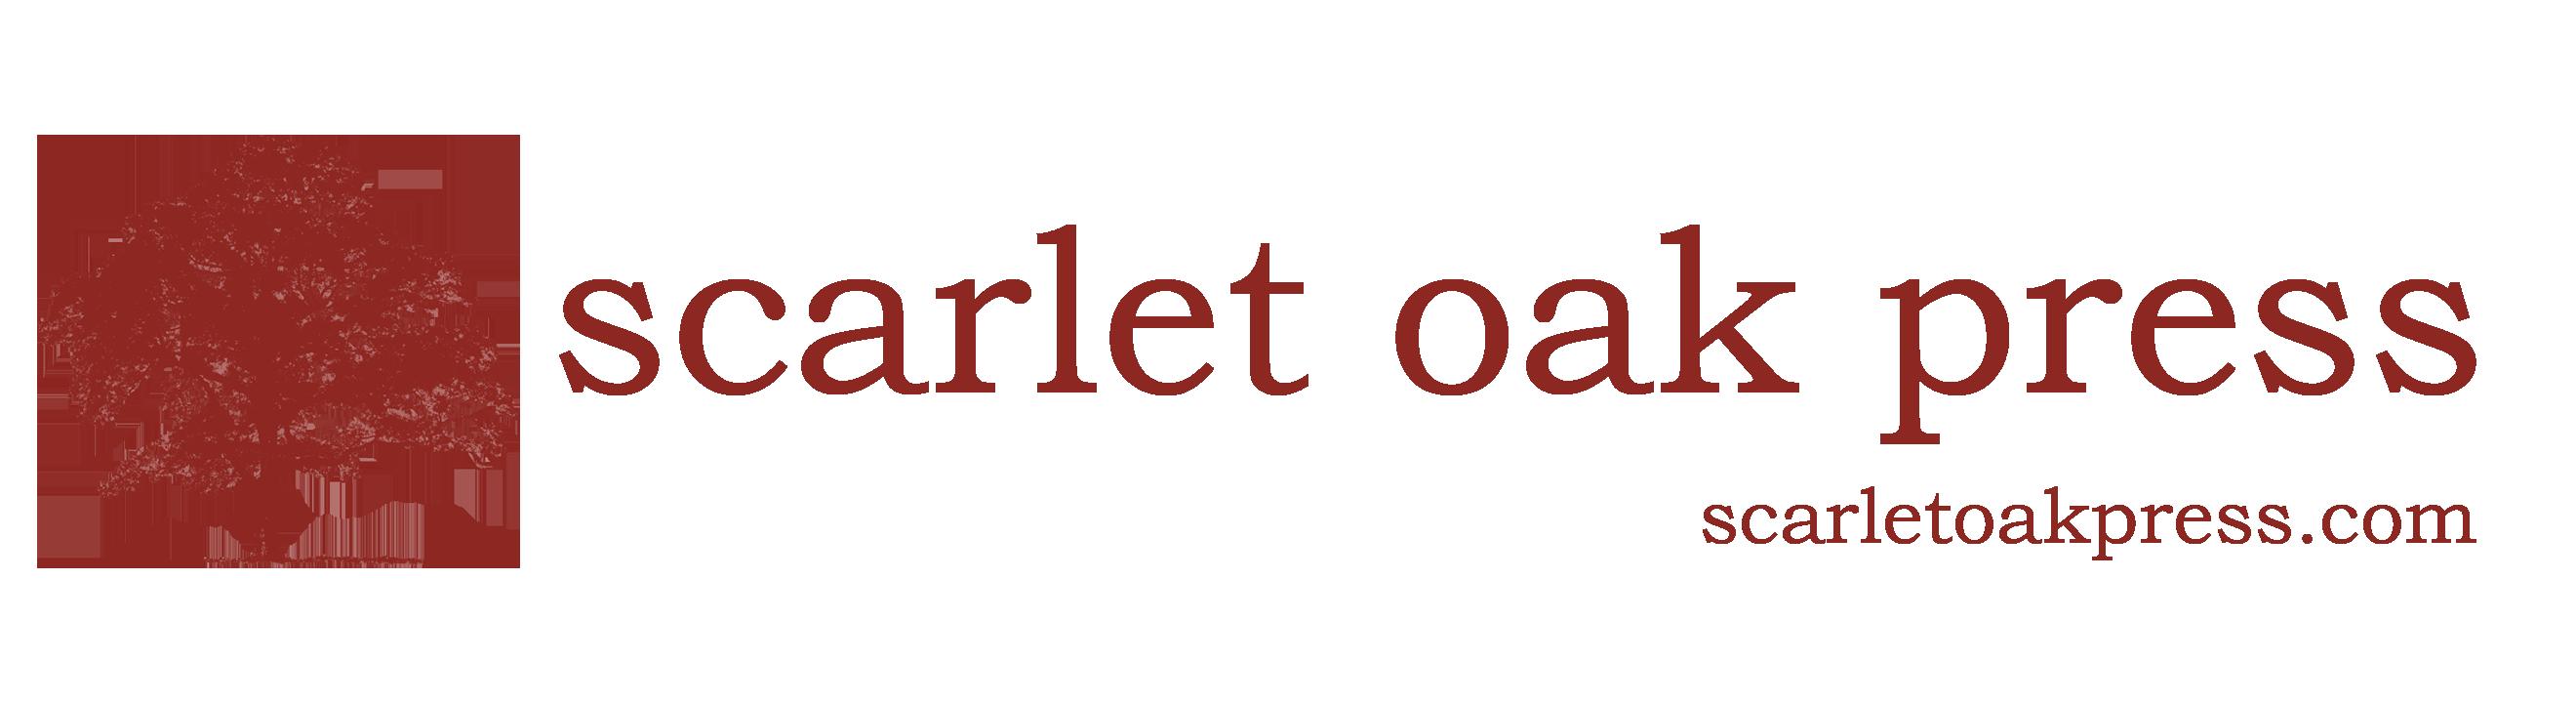 Scarlet Oak Press